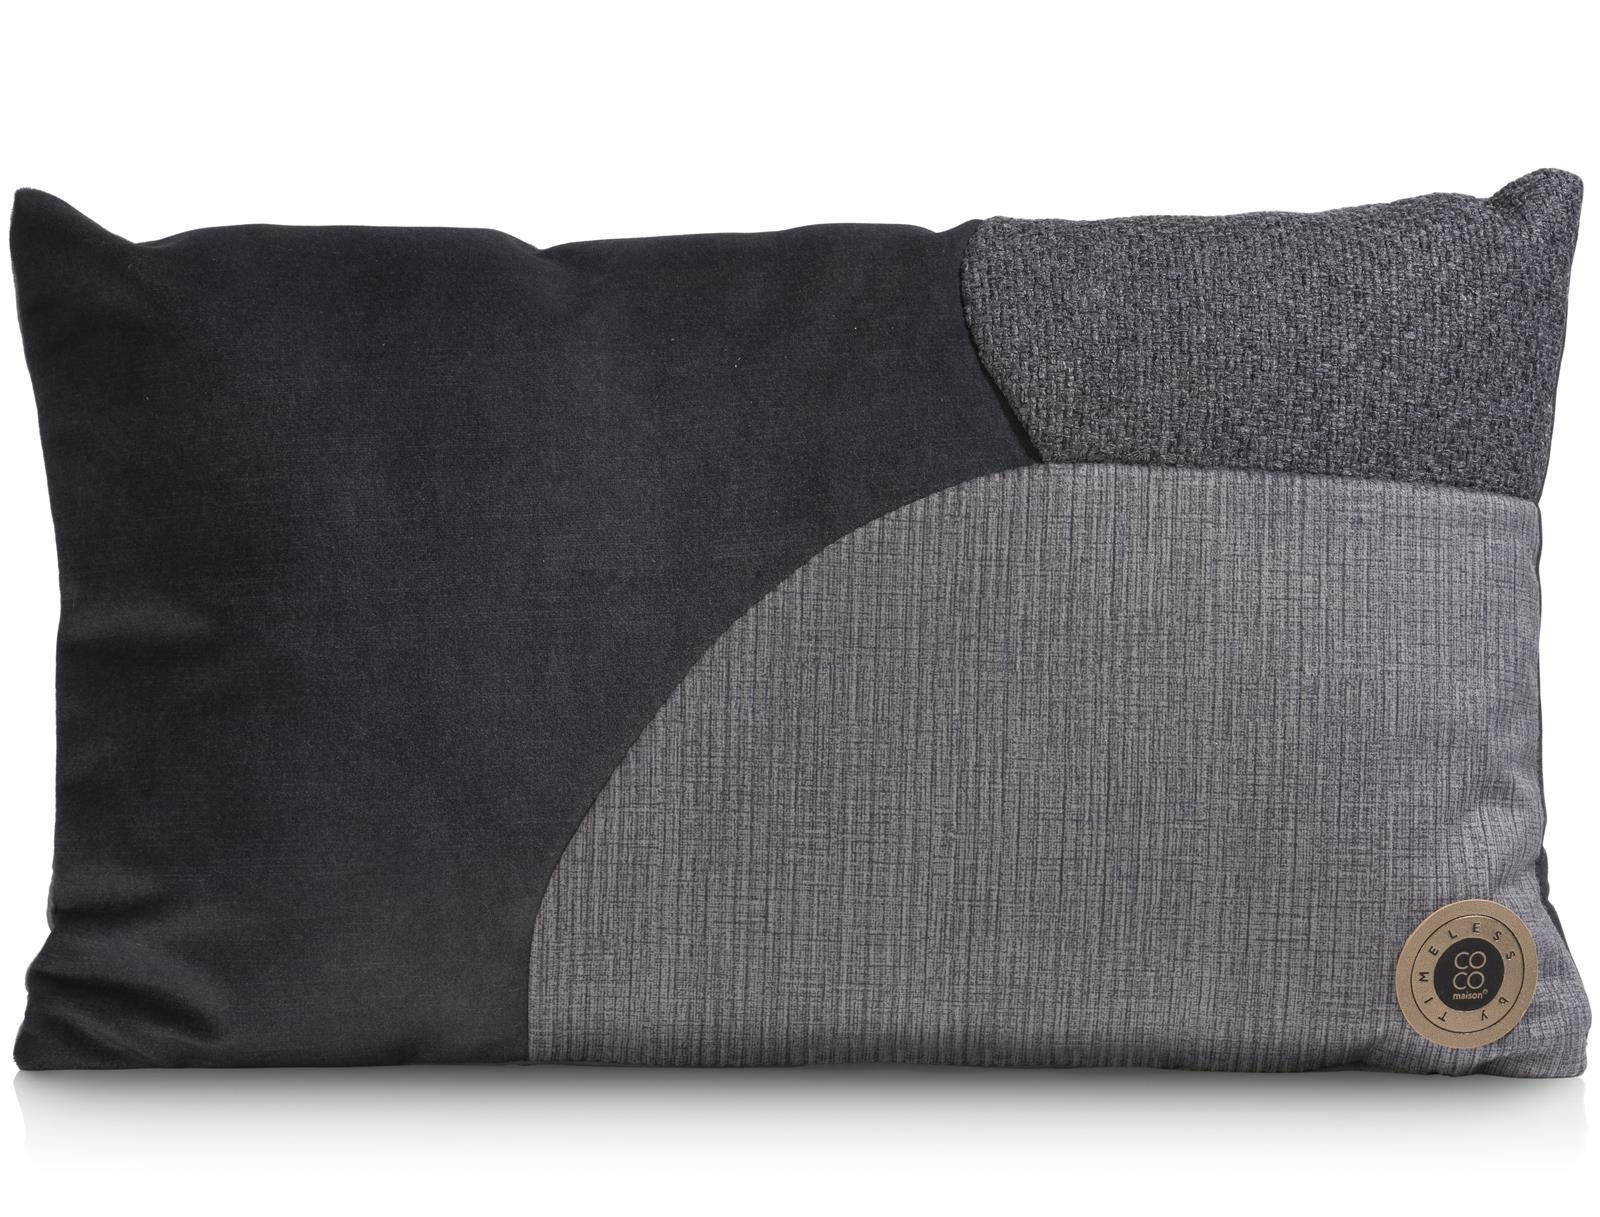 Coussin moderne rectangulaire en tissu gris anthracite